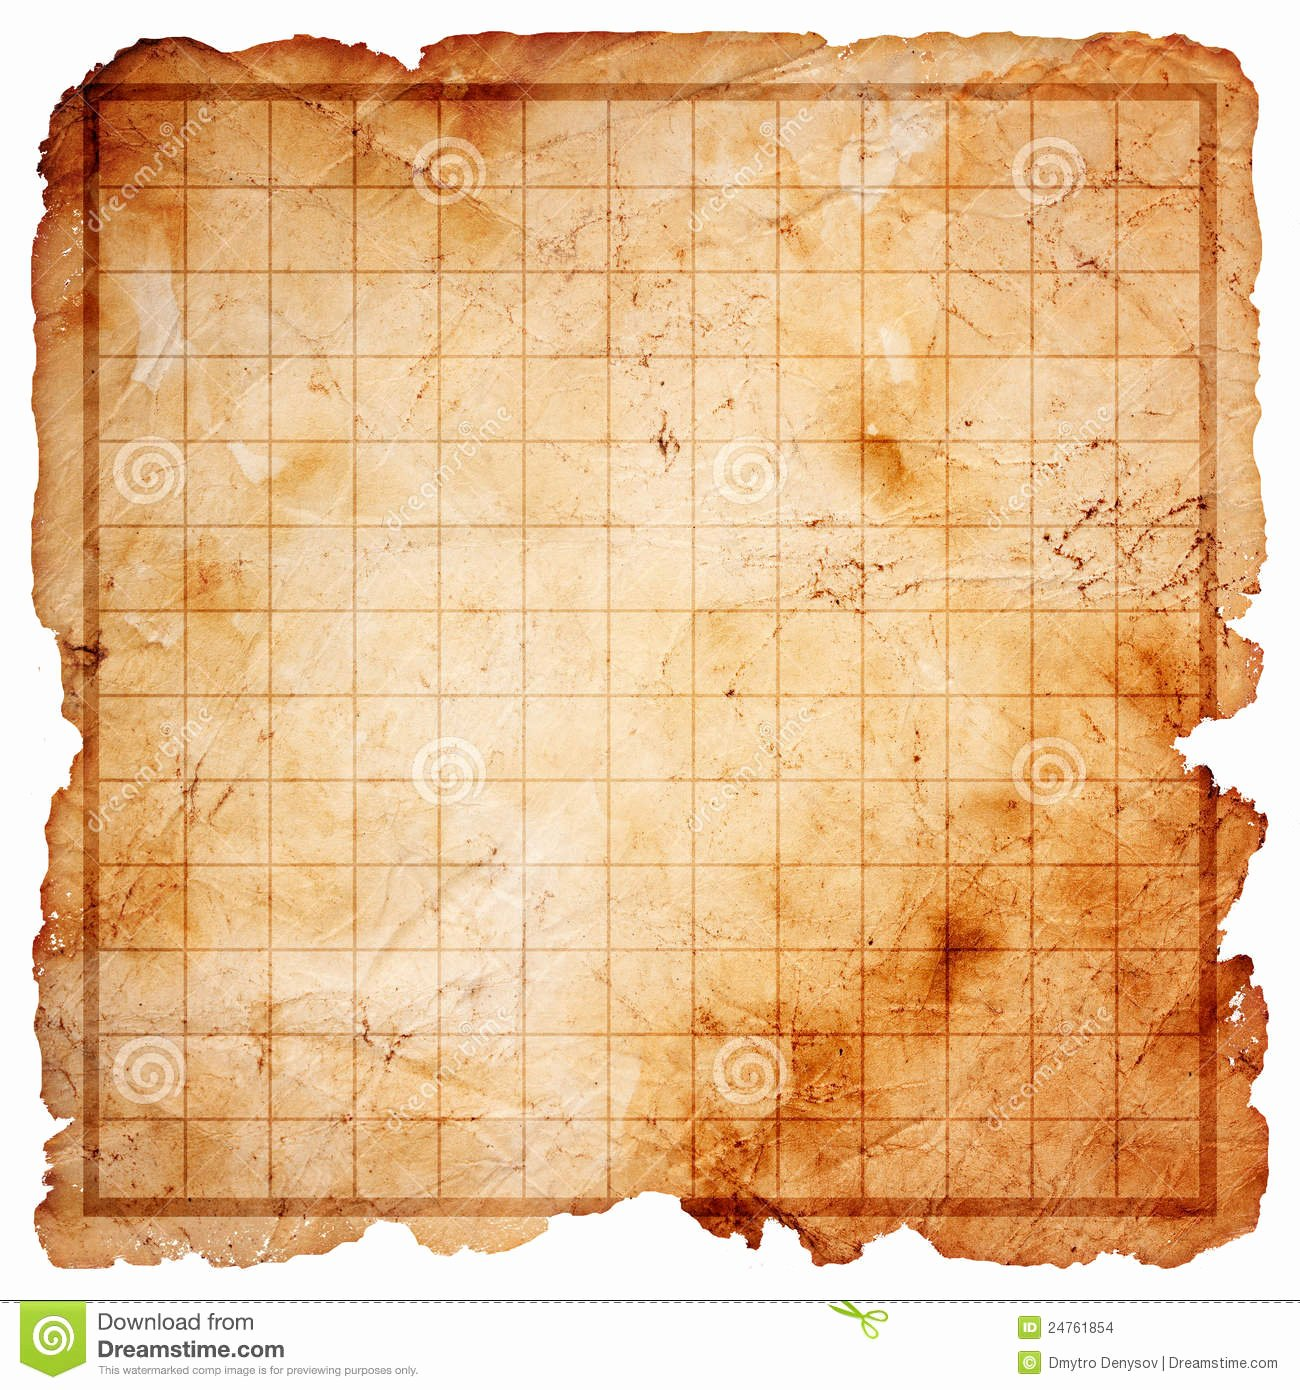 Printable Blank Treasure Map Beautiful Blank Pirate Treasure Map Stock Illustration Illustration